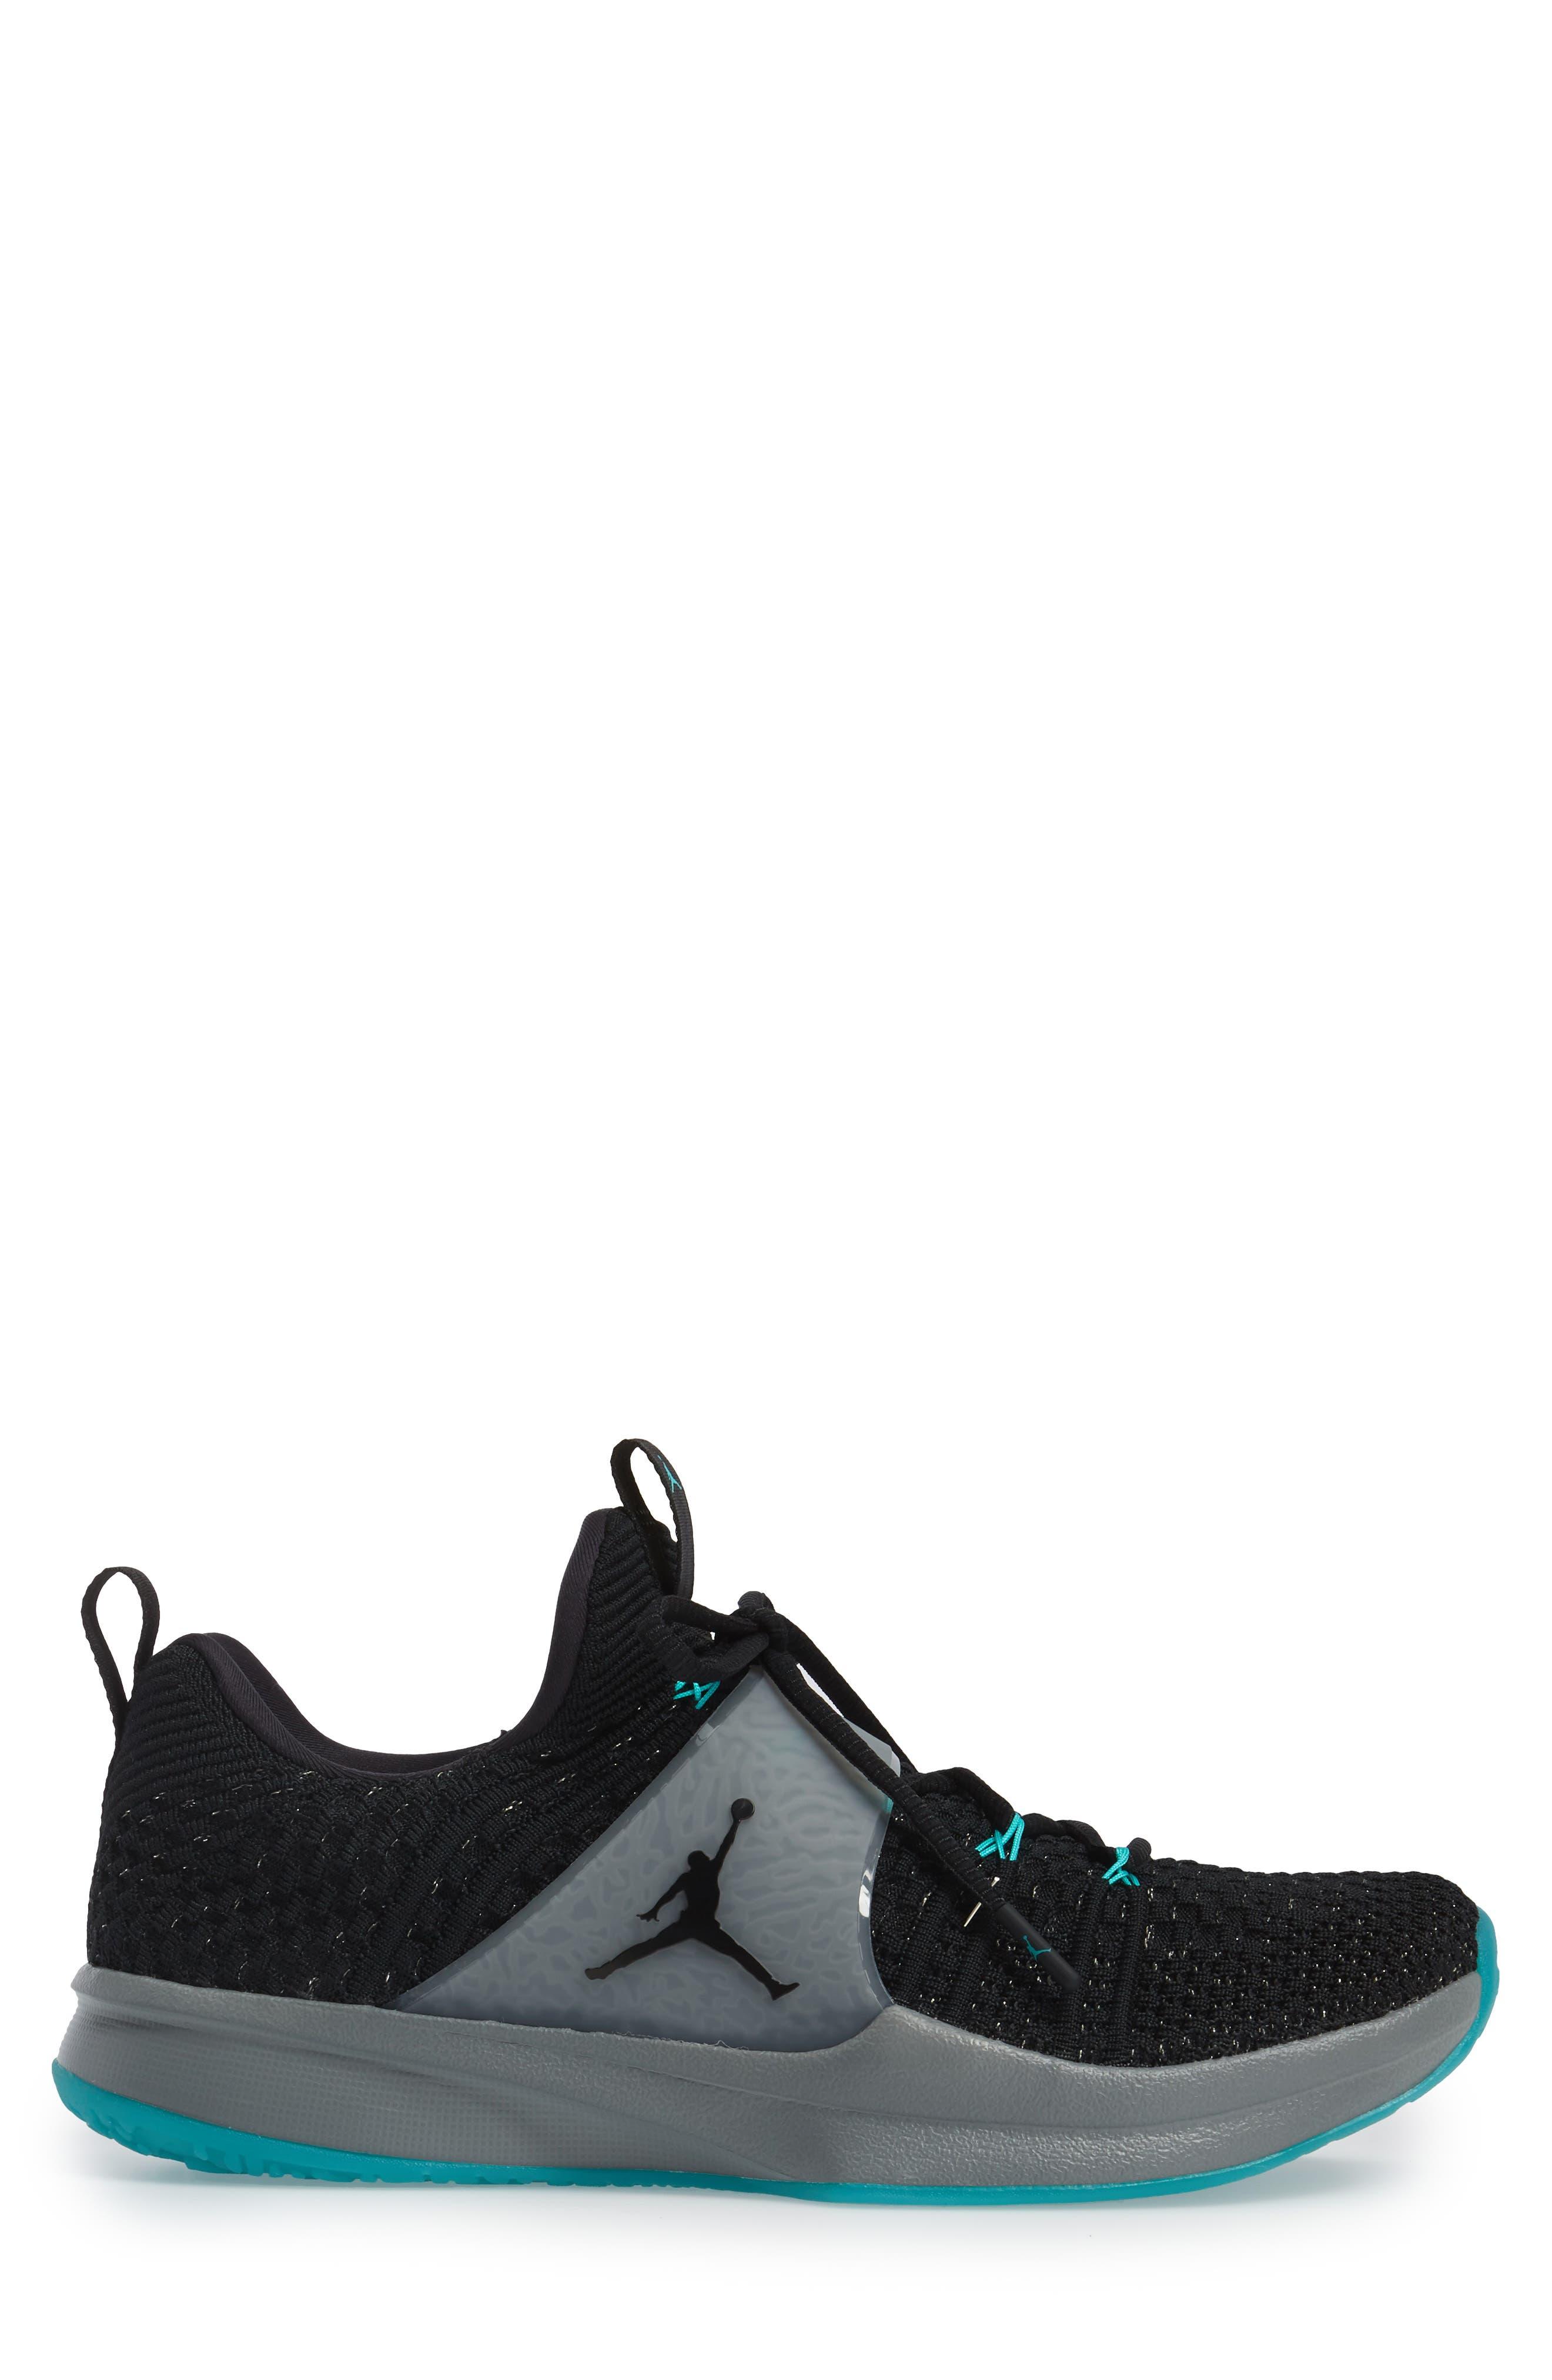 Jordan Flyknit Trainer 2 Low Sneaker,                             Alternate thumbnail 13, color,